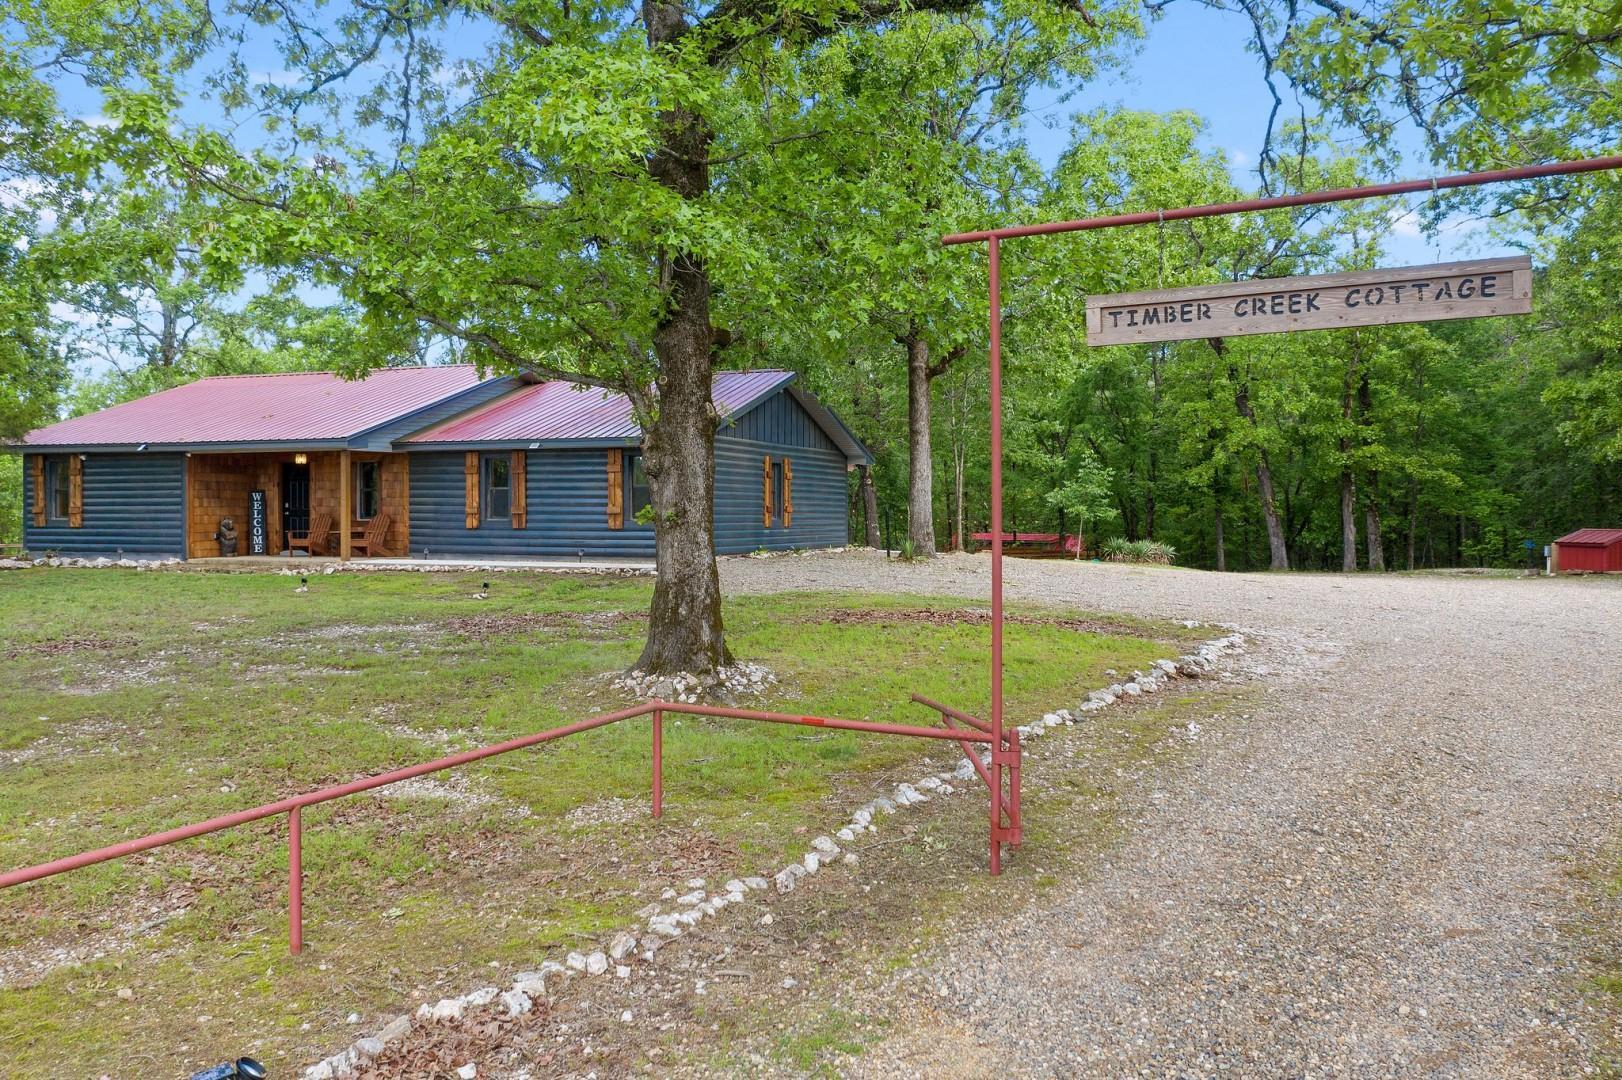 Timber Creek Cottage